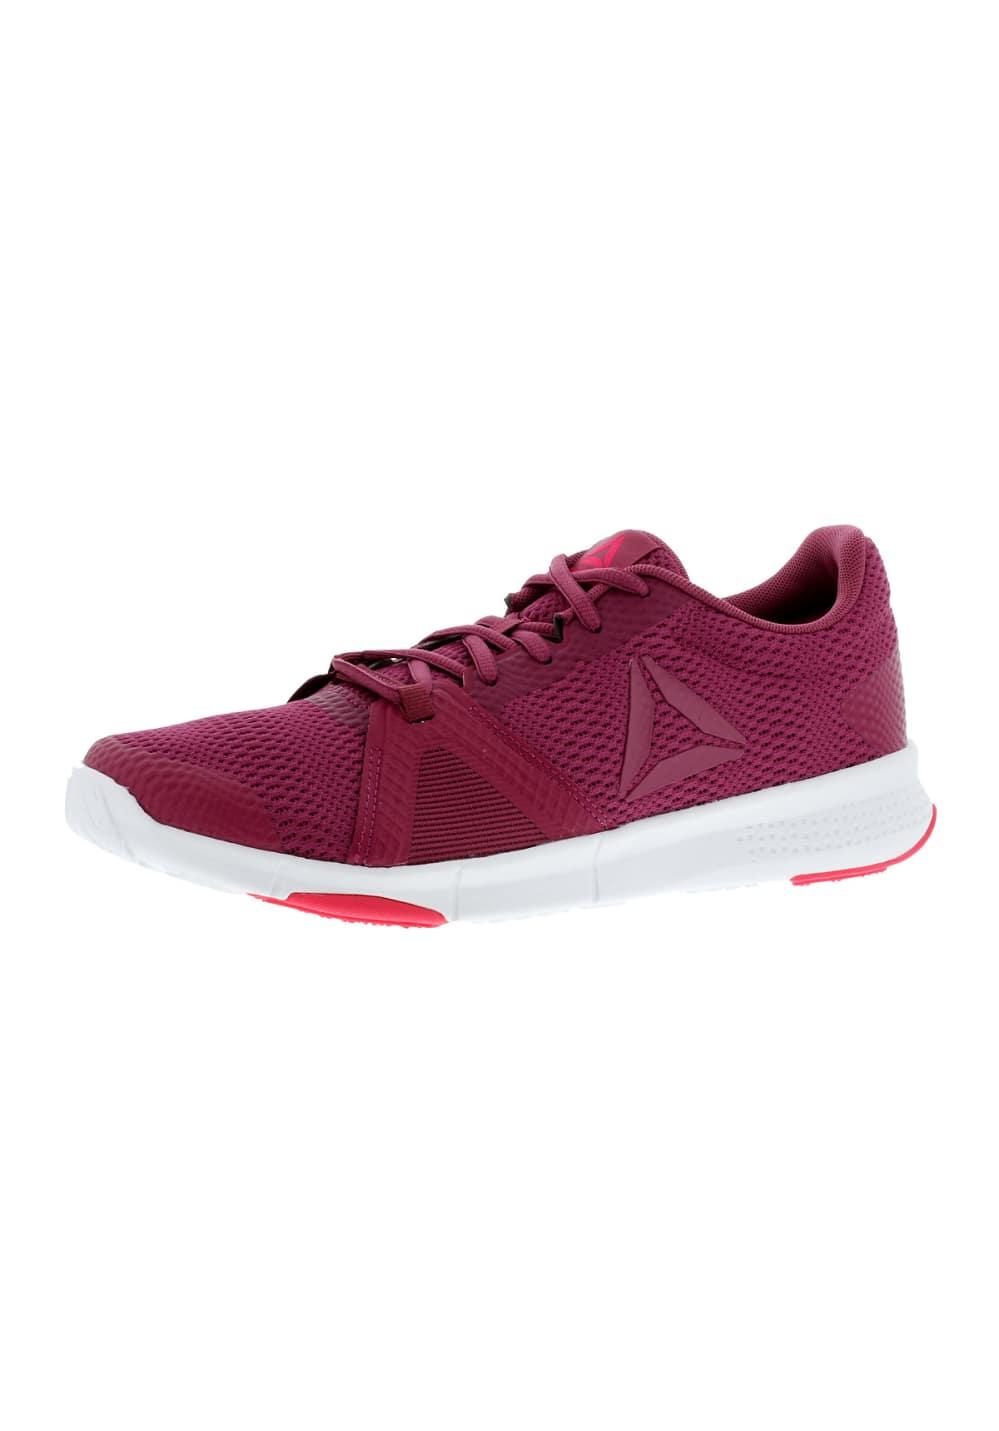 57862e712c51 Reebok Reebok Flexile - Fitness shoes for Women - Red